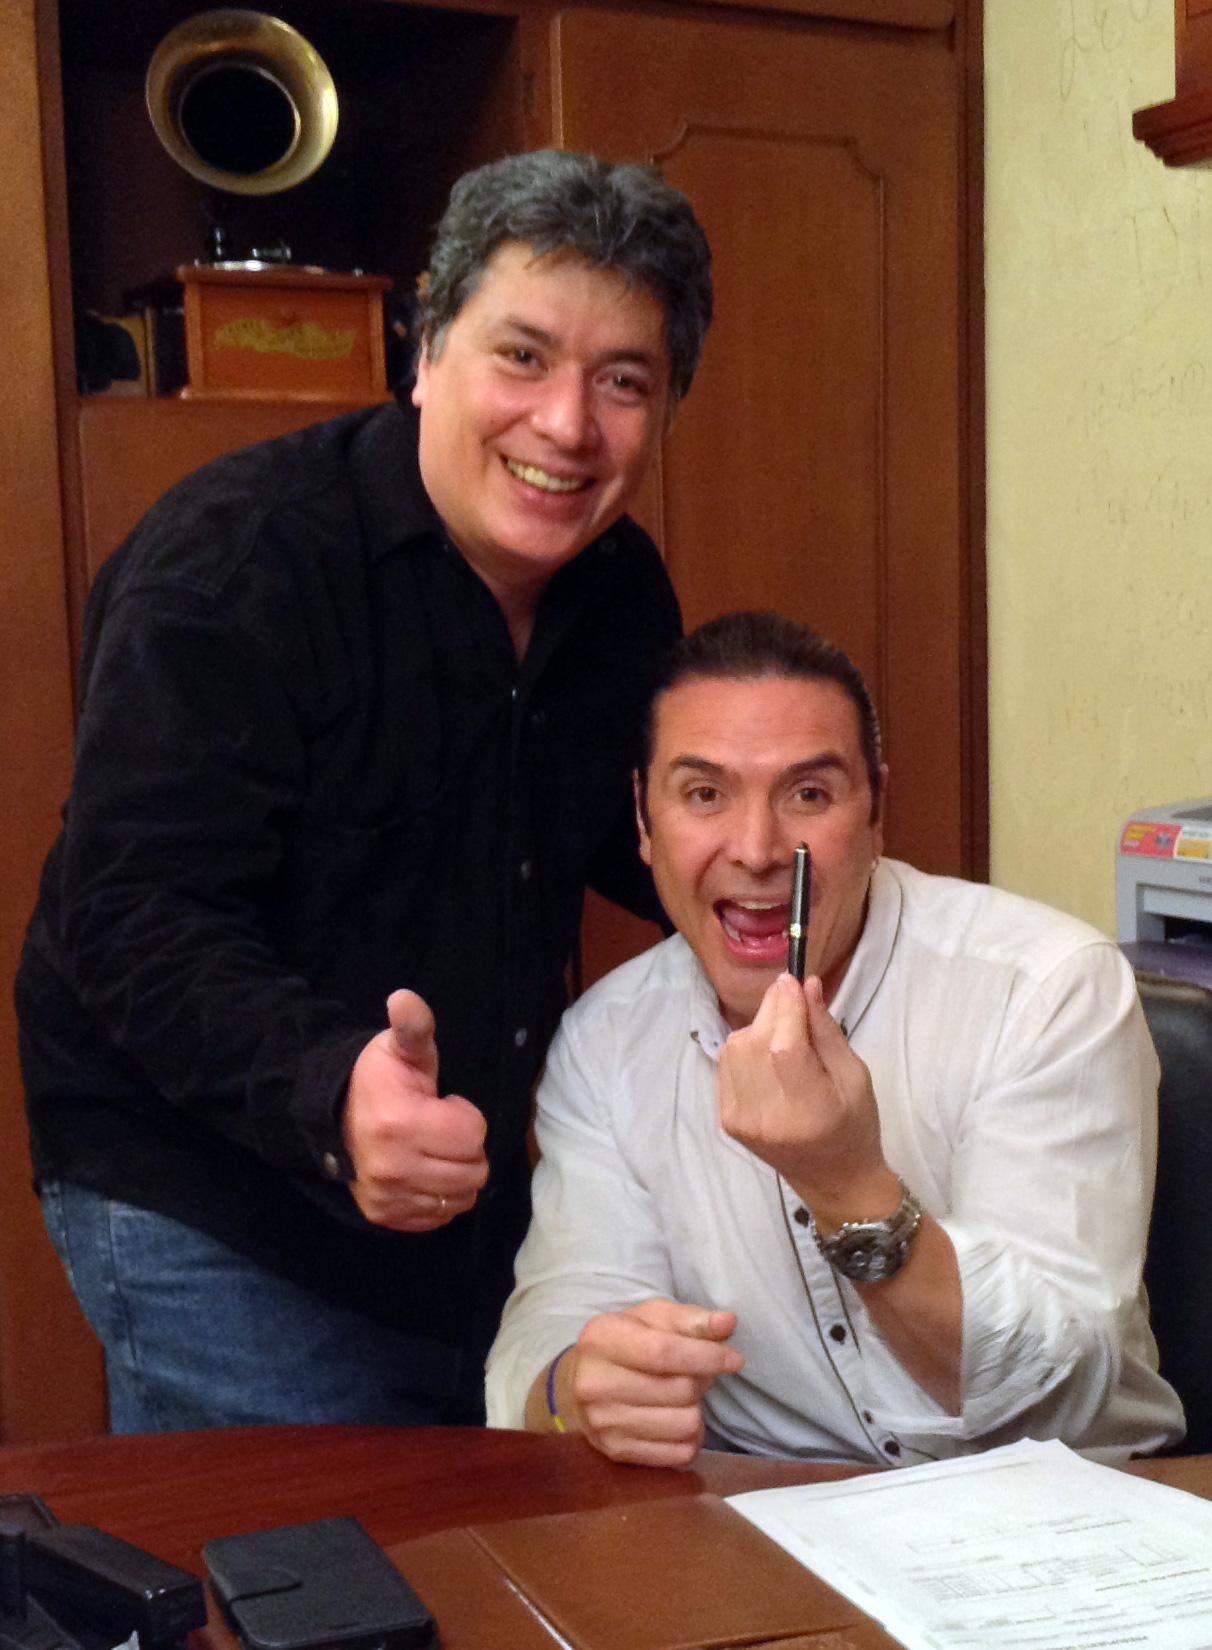 Iván Sánchez Vásquez, con Leonídas Núñez Hernández, Manager de Iván y Sus Bam Band, en su oficina de Bogotá.